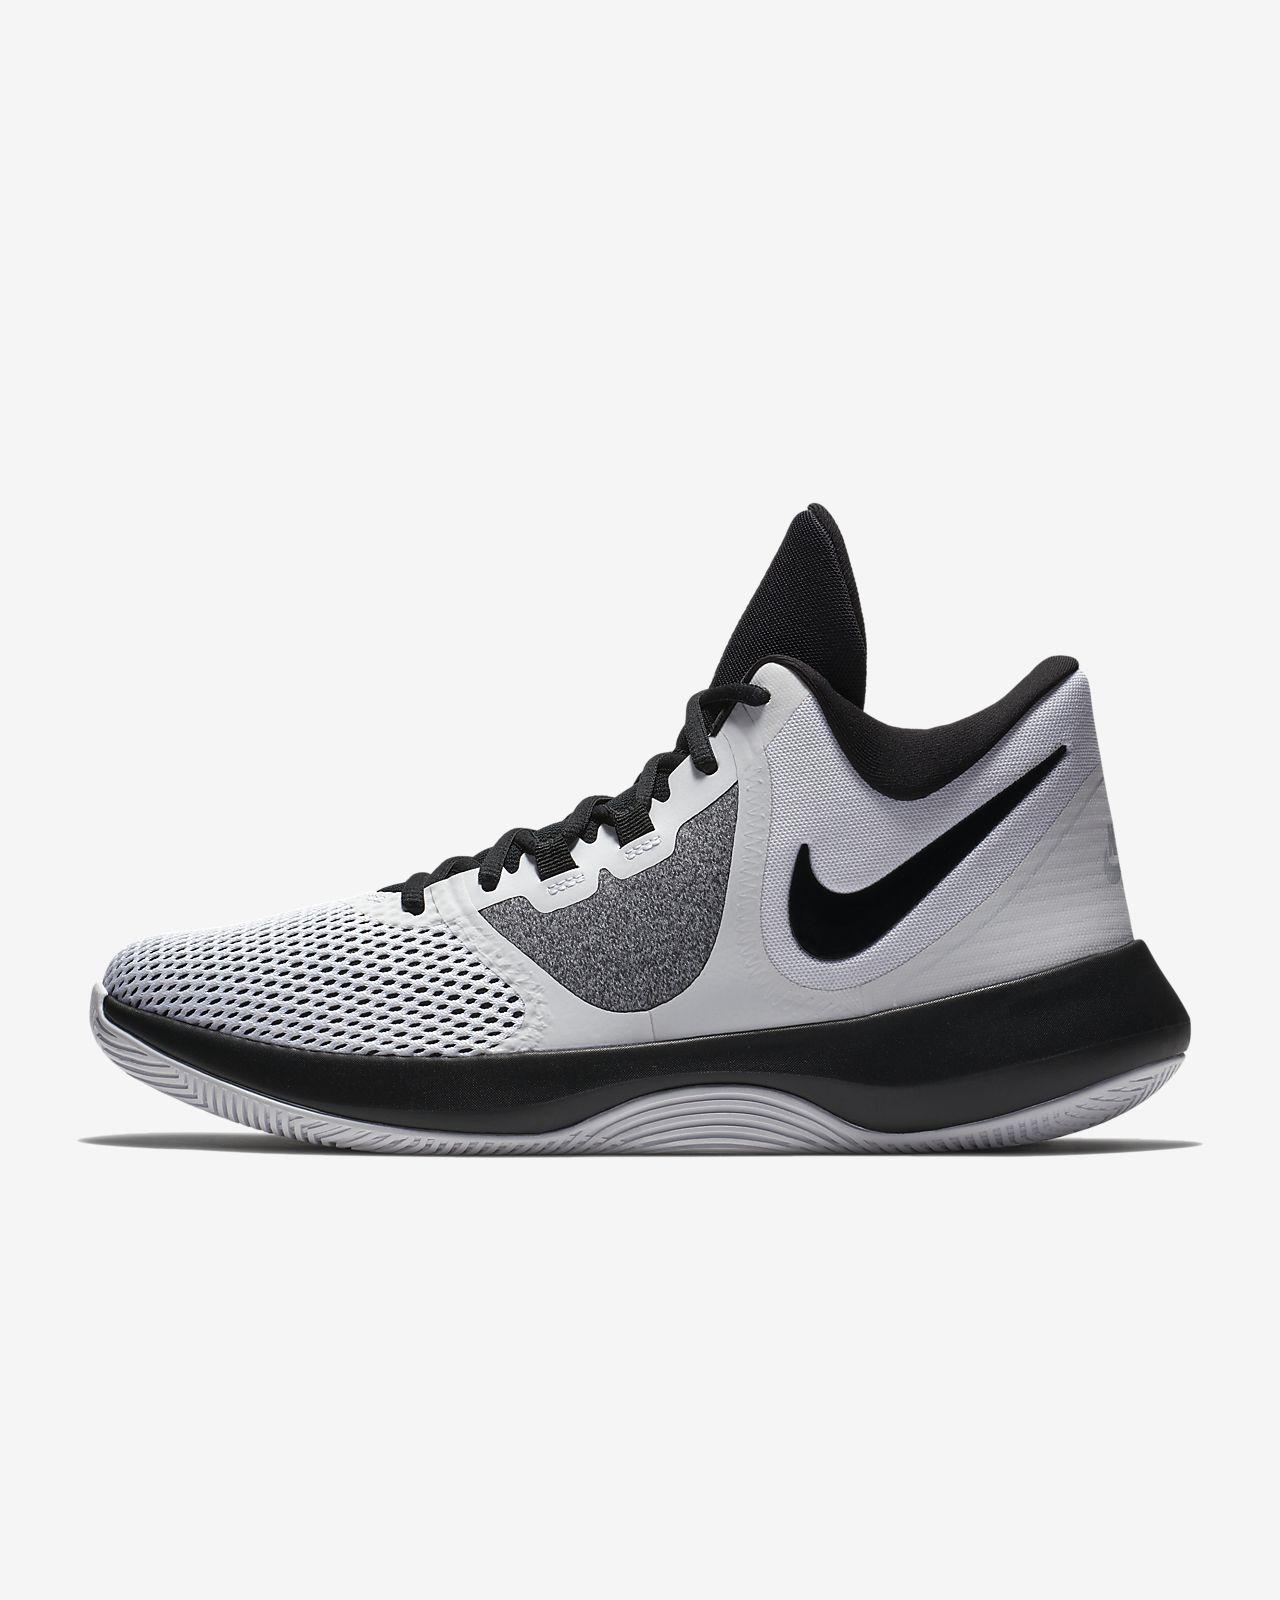 NIKE Air Precision II  AA7069-002  Men/'s Basketball Shoe Black NEW  8.5 /& 10.5 M